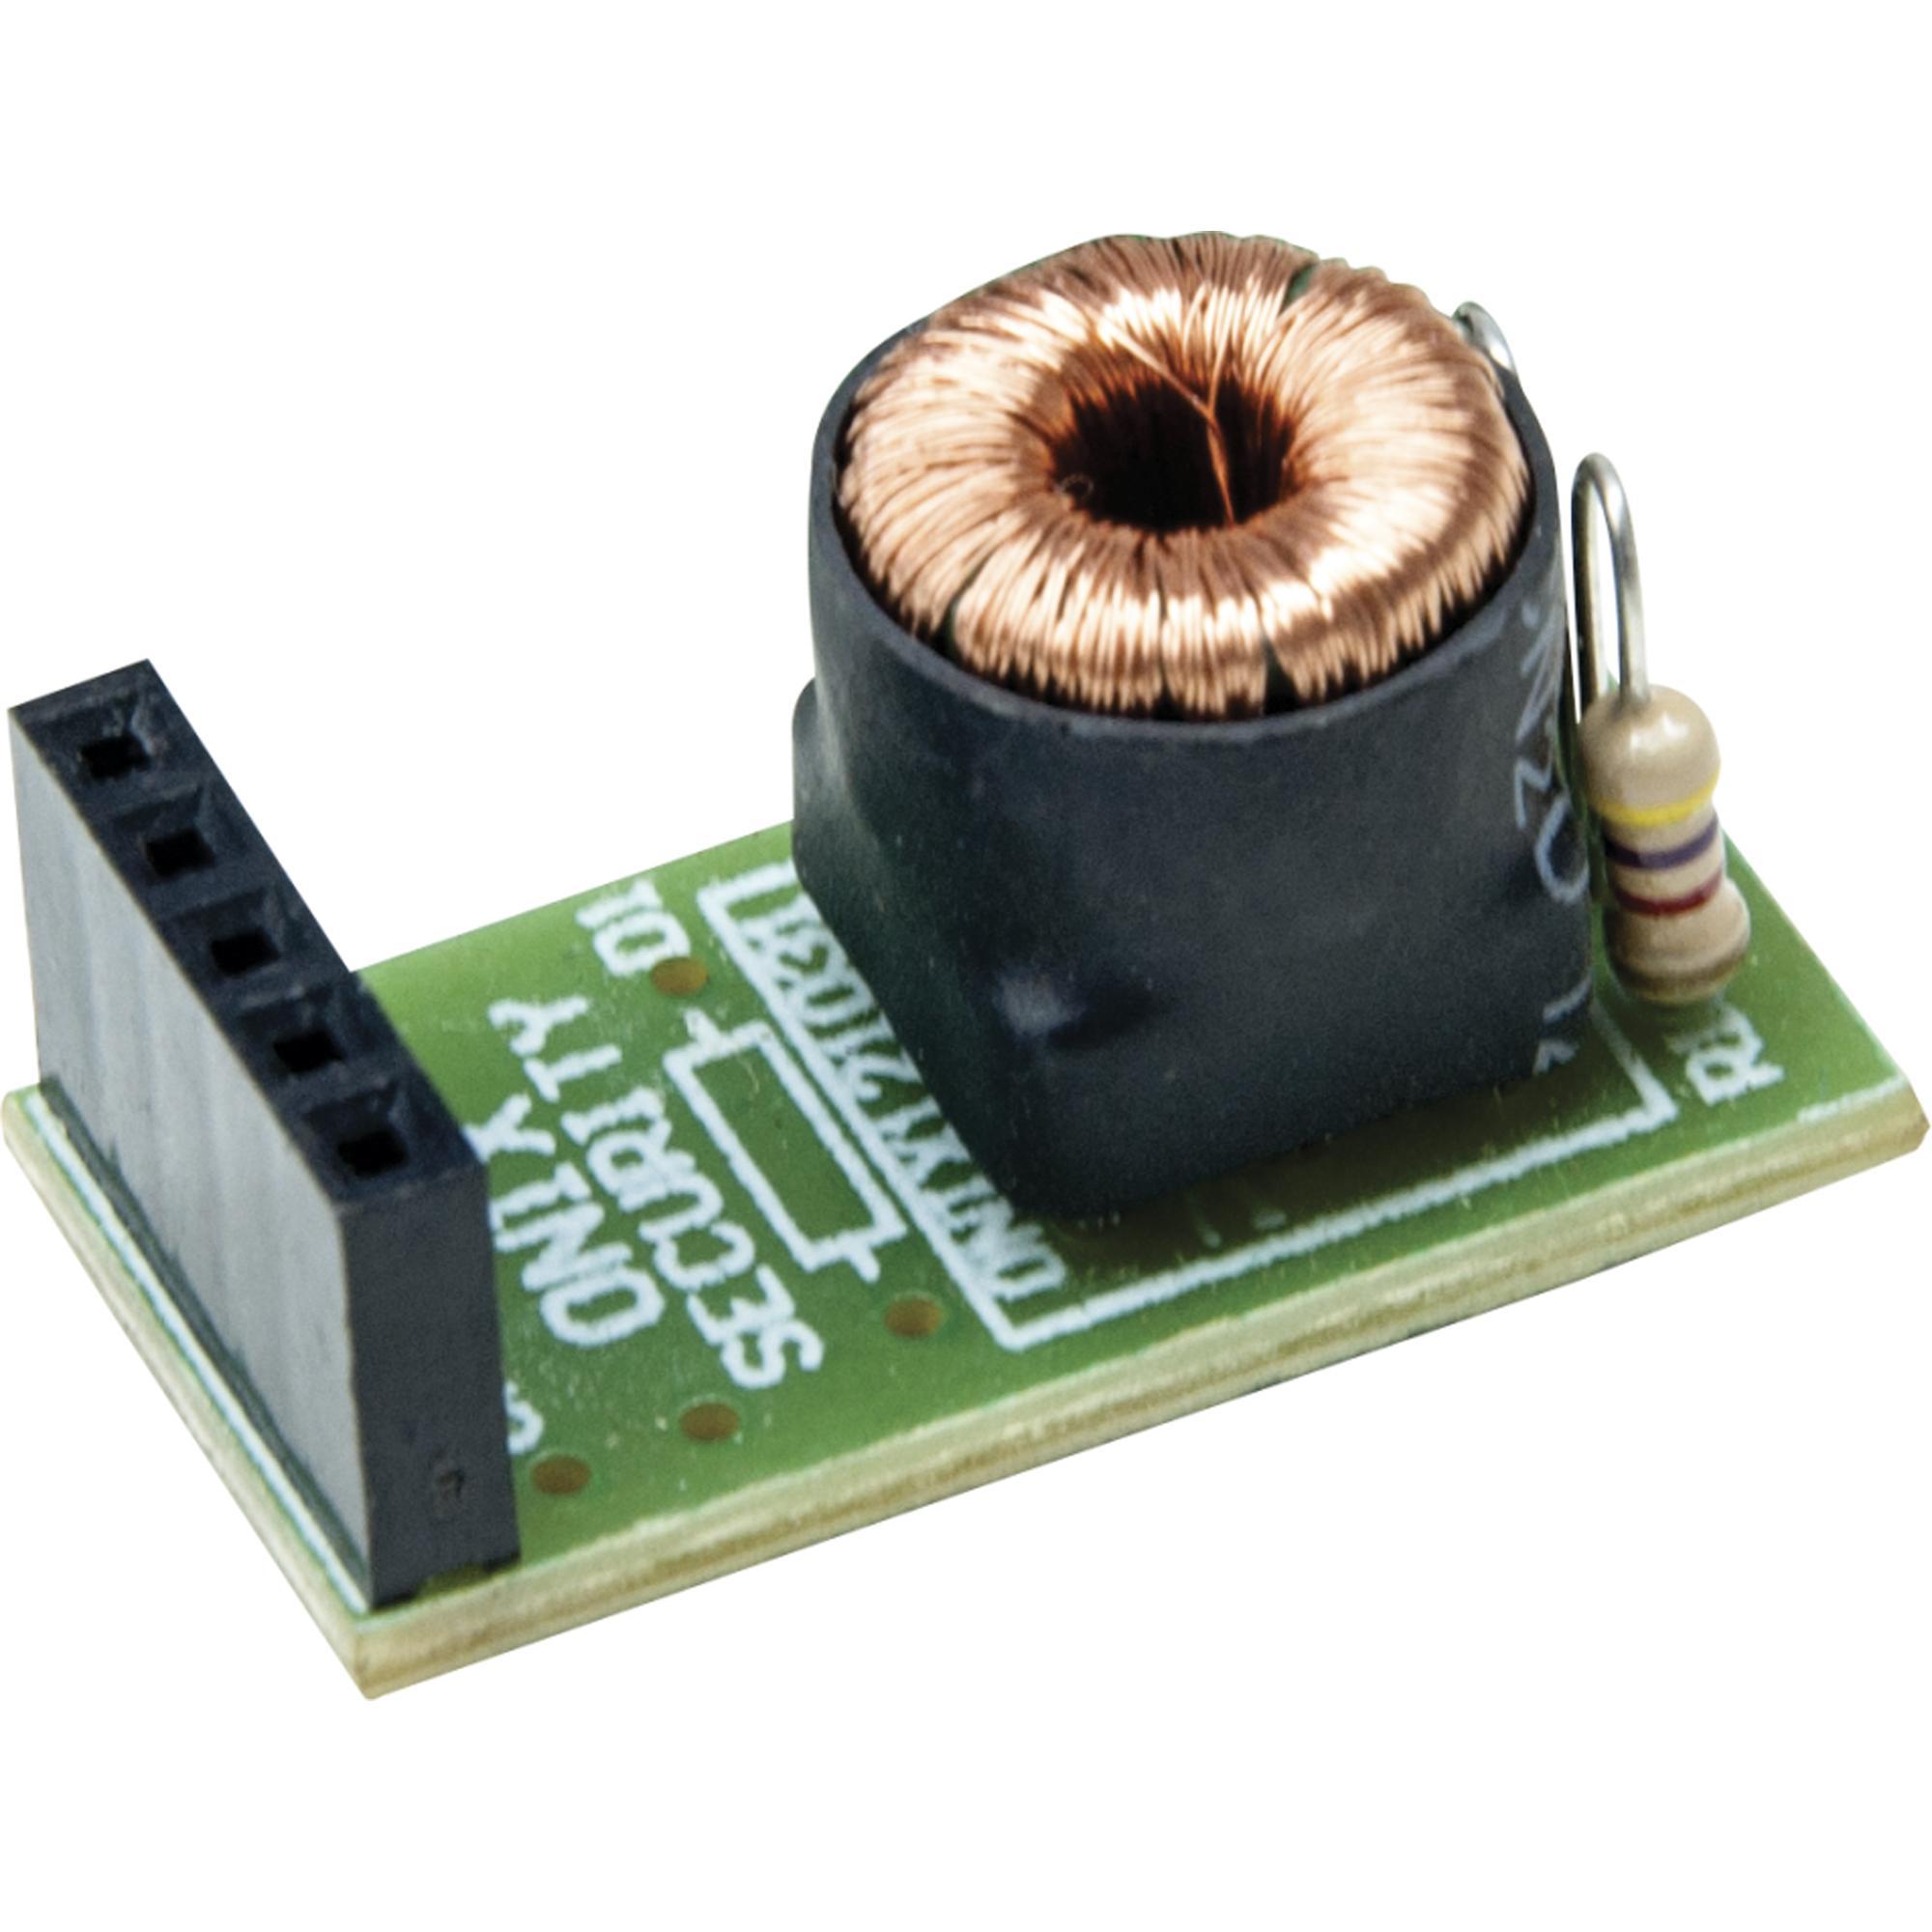 conversor video balun hd para rack hibrido onix - onx - 1580